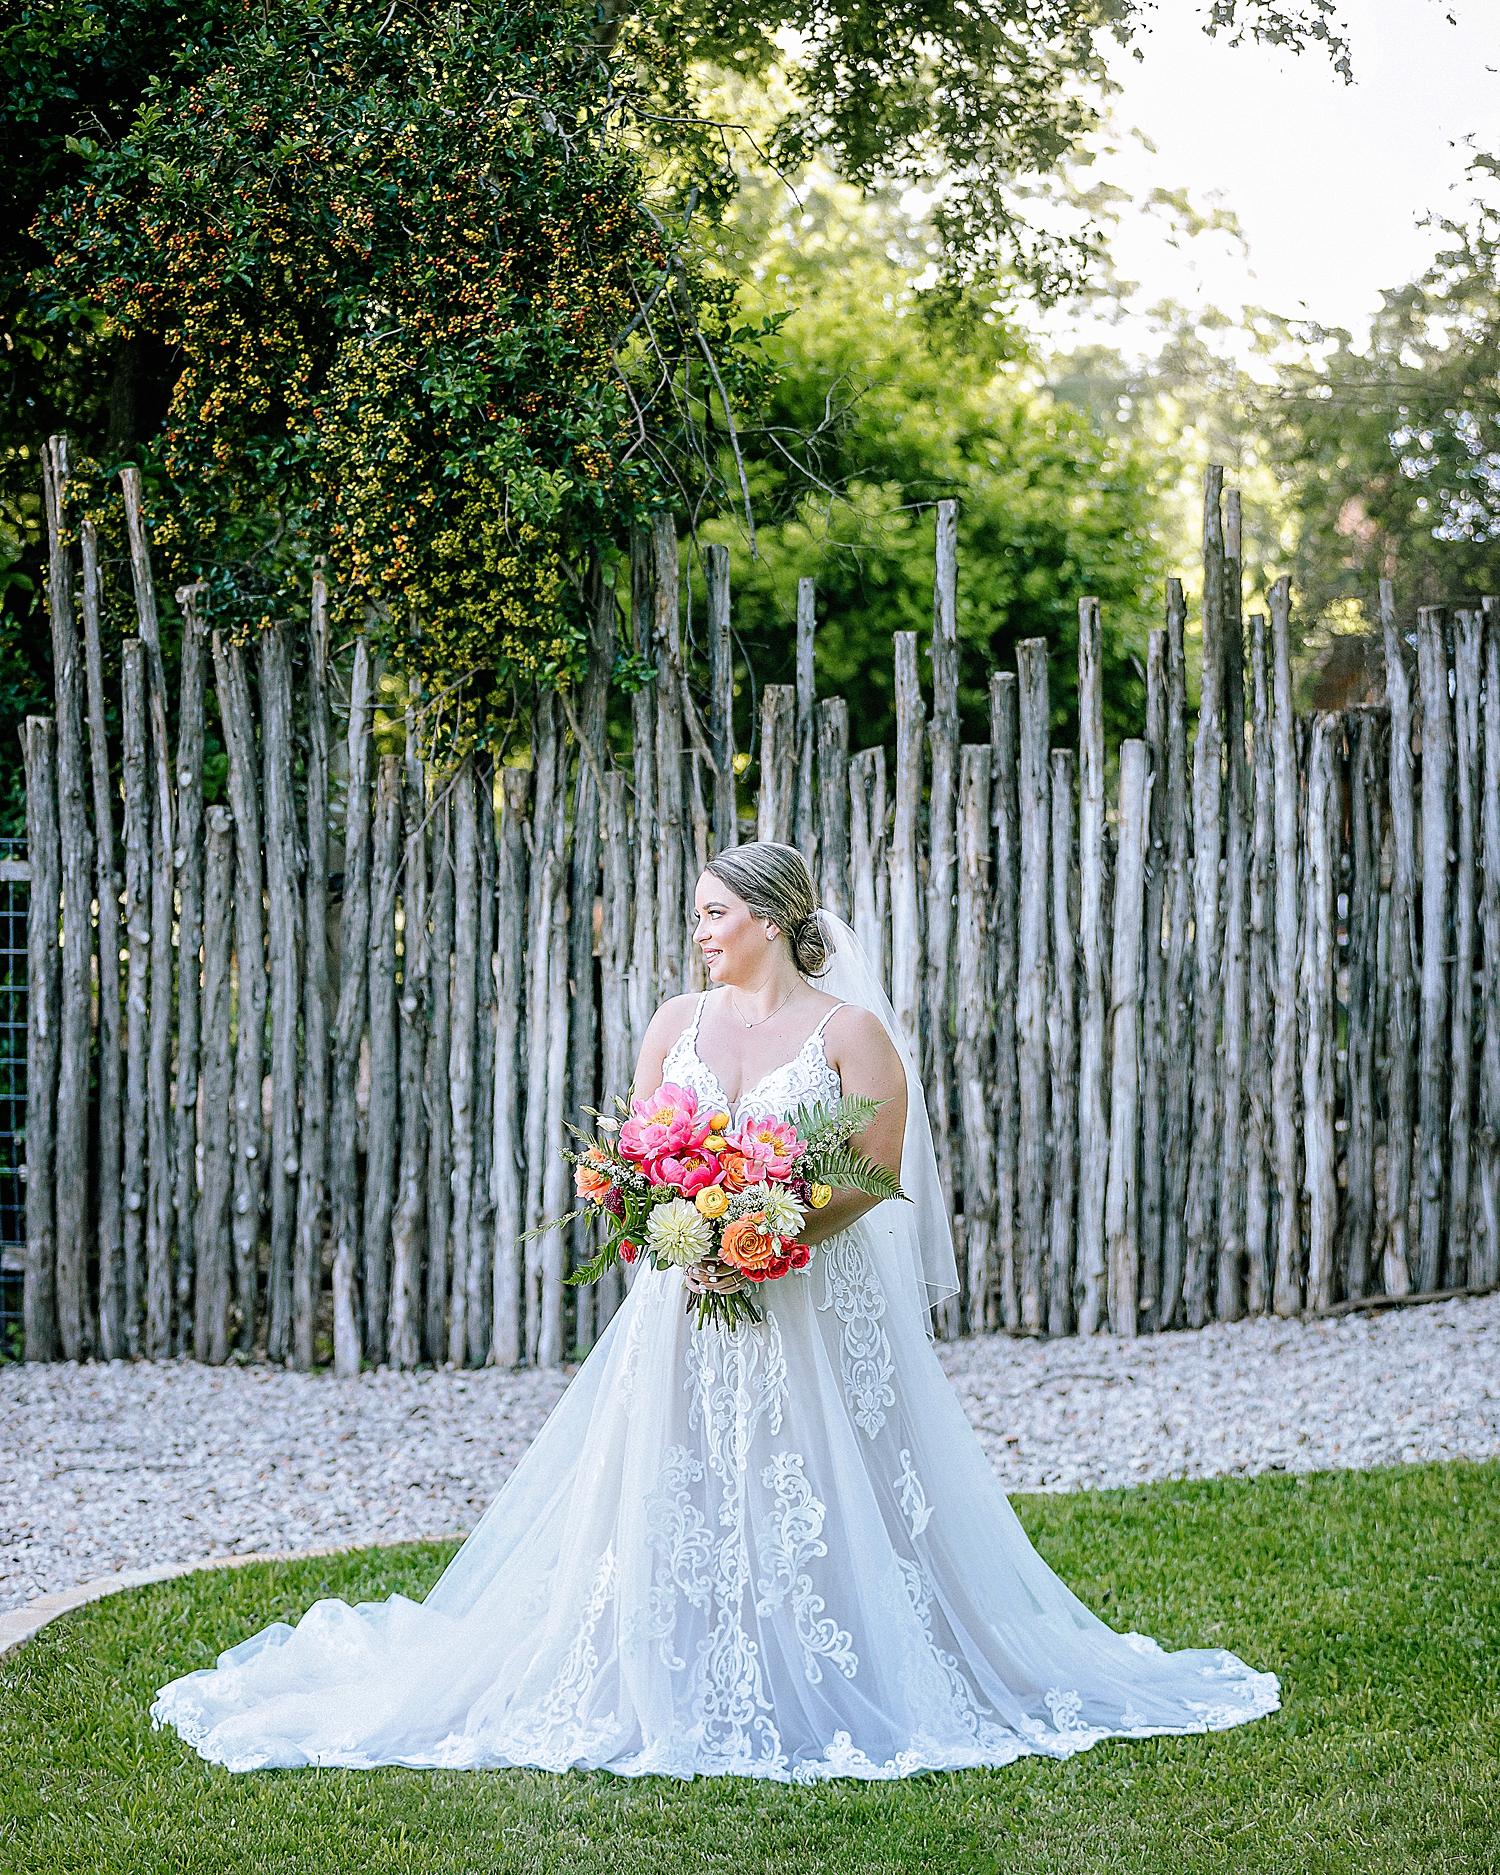 Gruene-Estate-Wedding-New-Braunfels-Bride-Bridal-Photos-Carly-Barton-Photography_0006.jpg